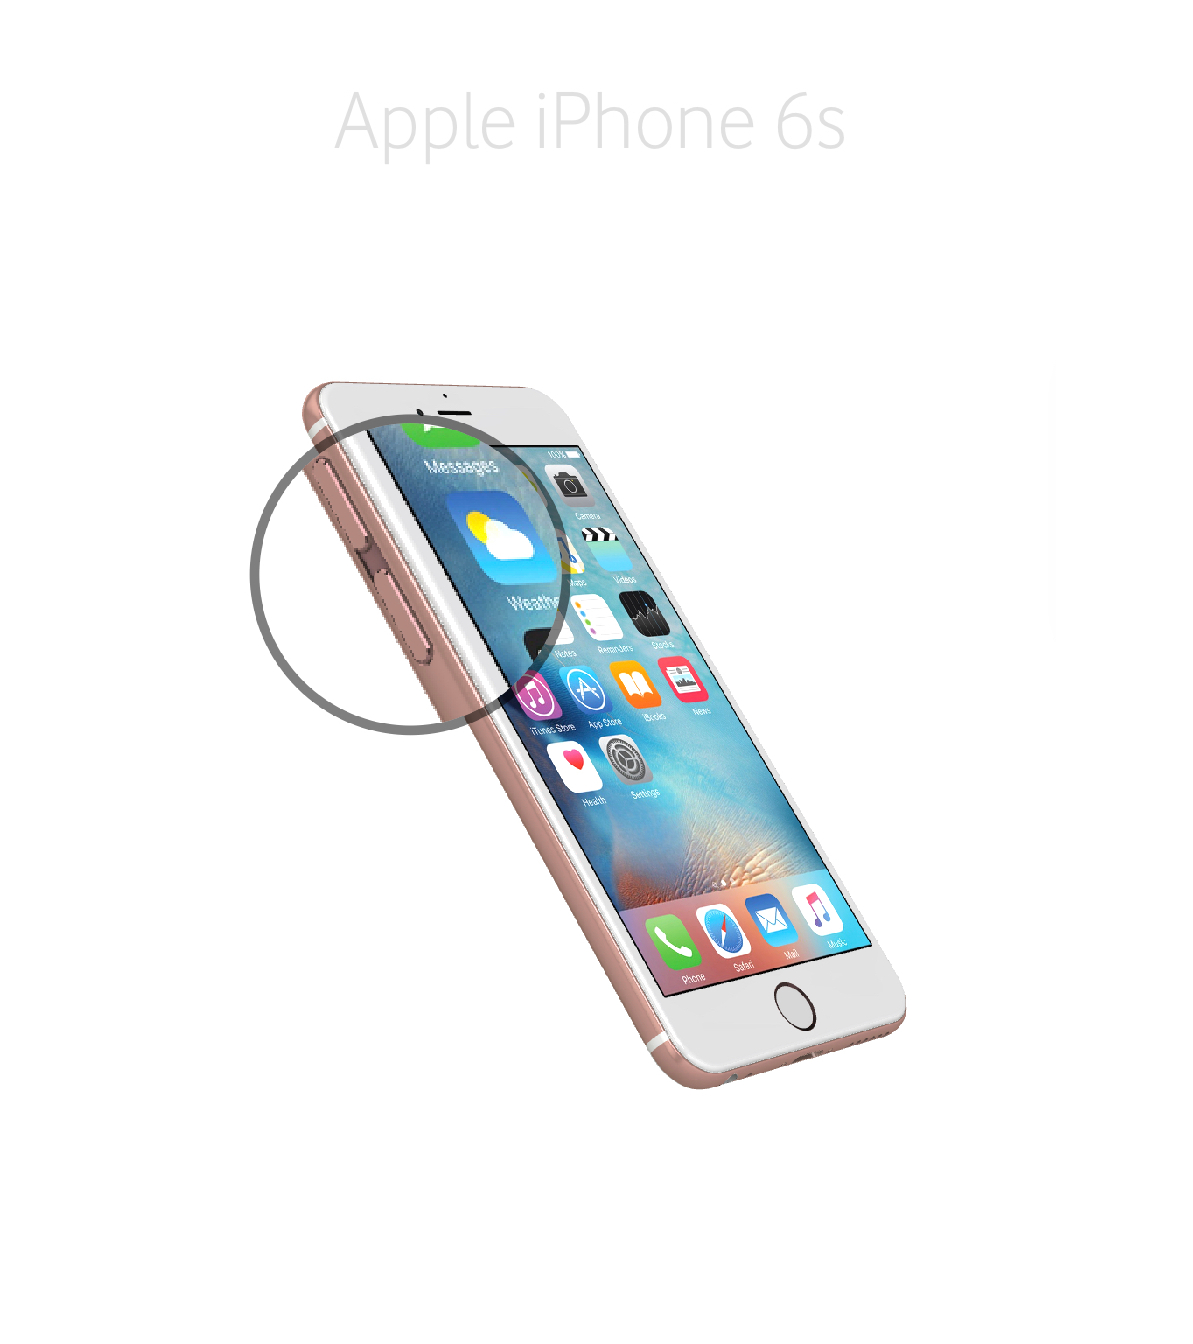 Laga volym/muteknapp iPhone 6s